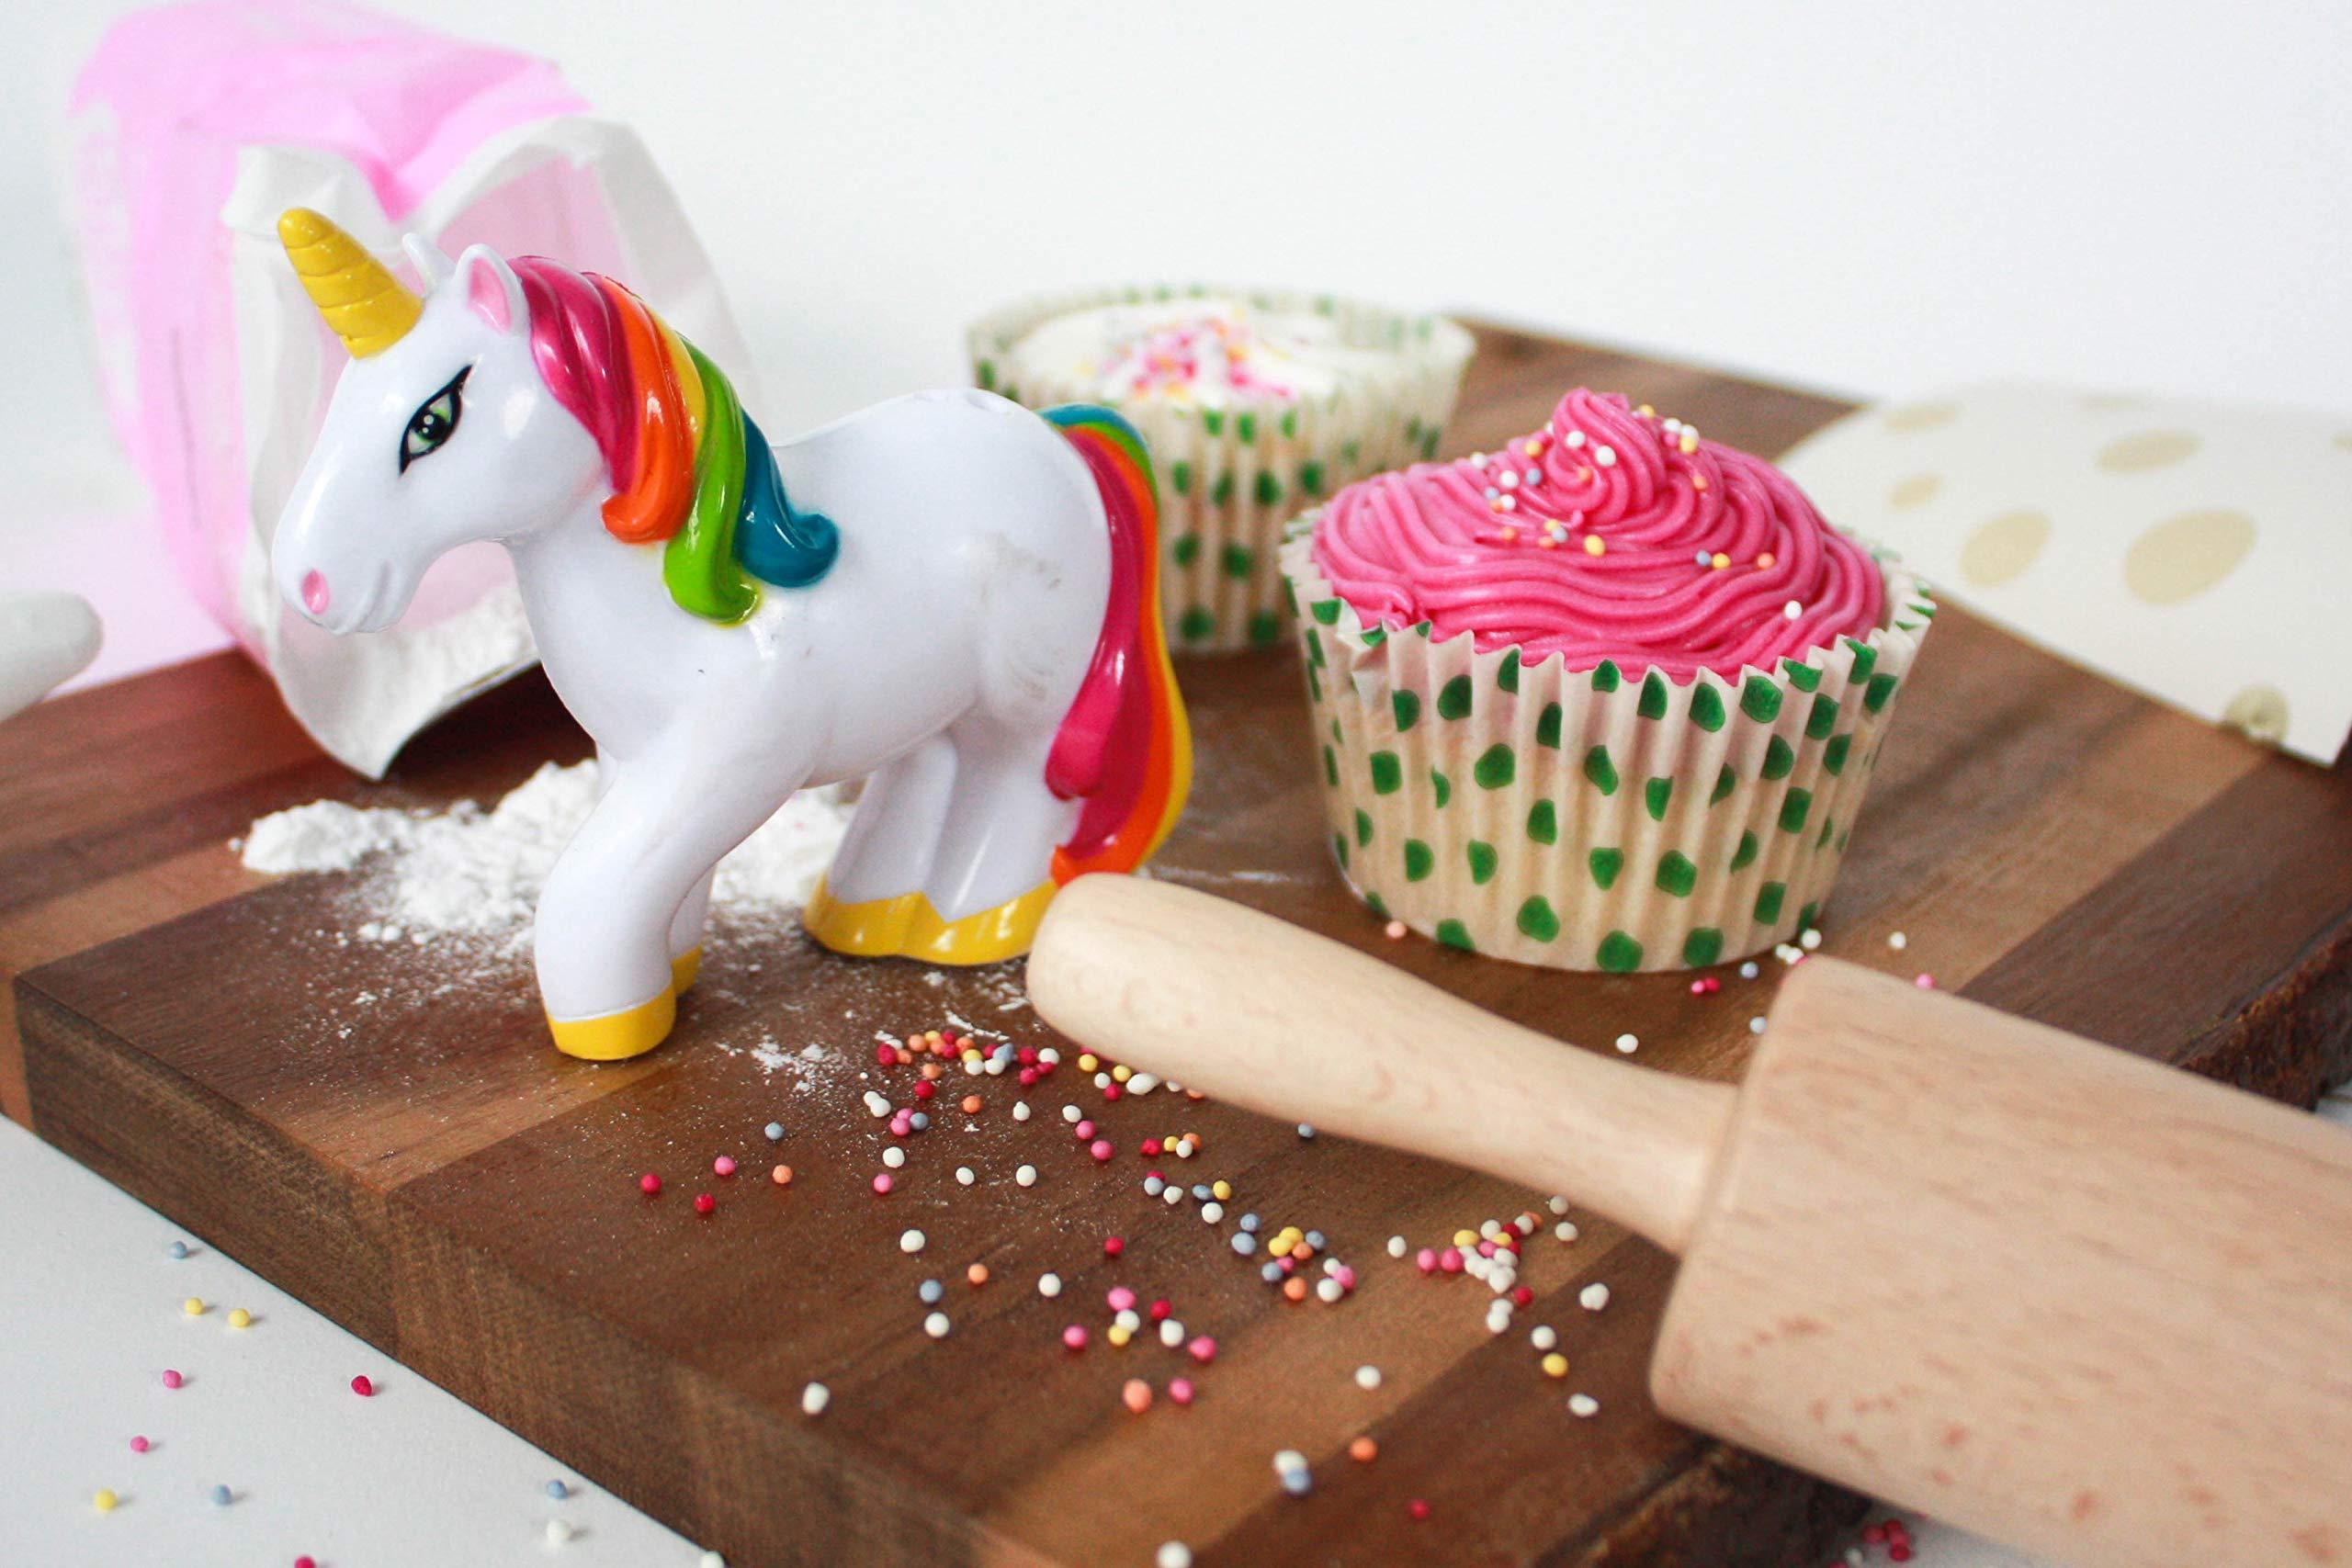 Spinning Hat Unicorn Sprinkles Sugar Shaker 2